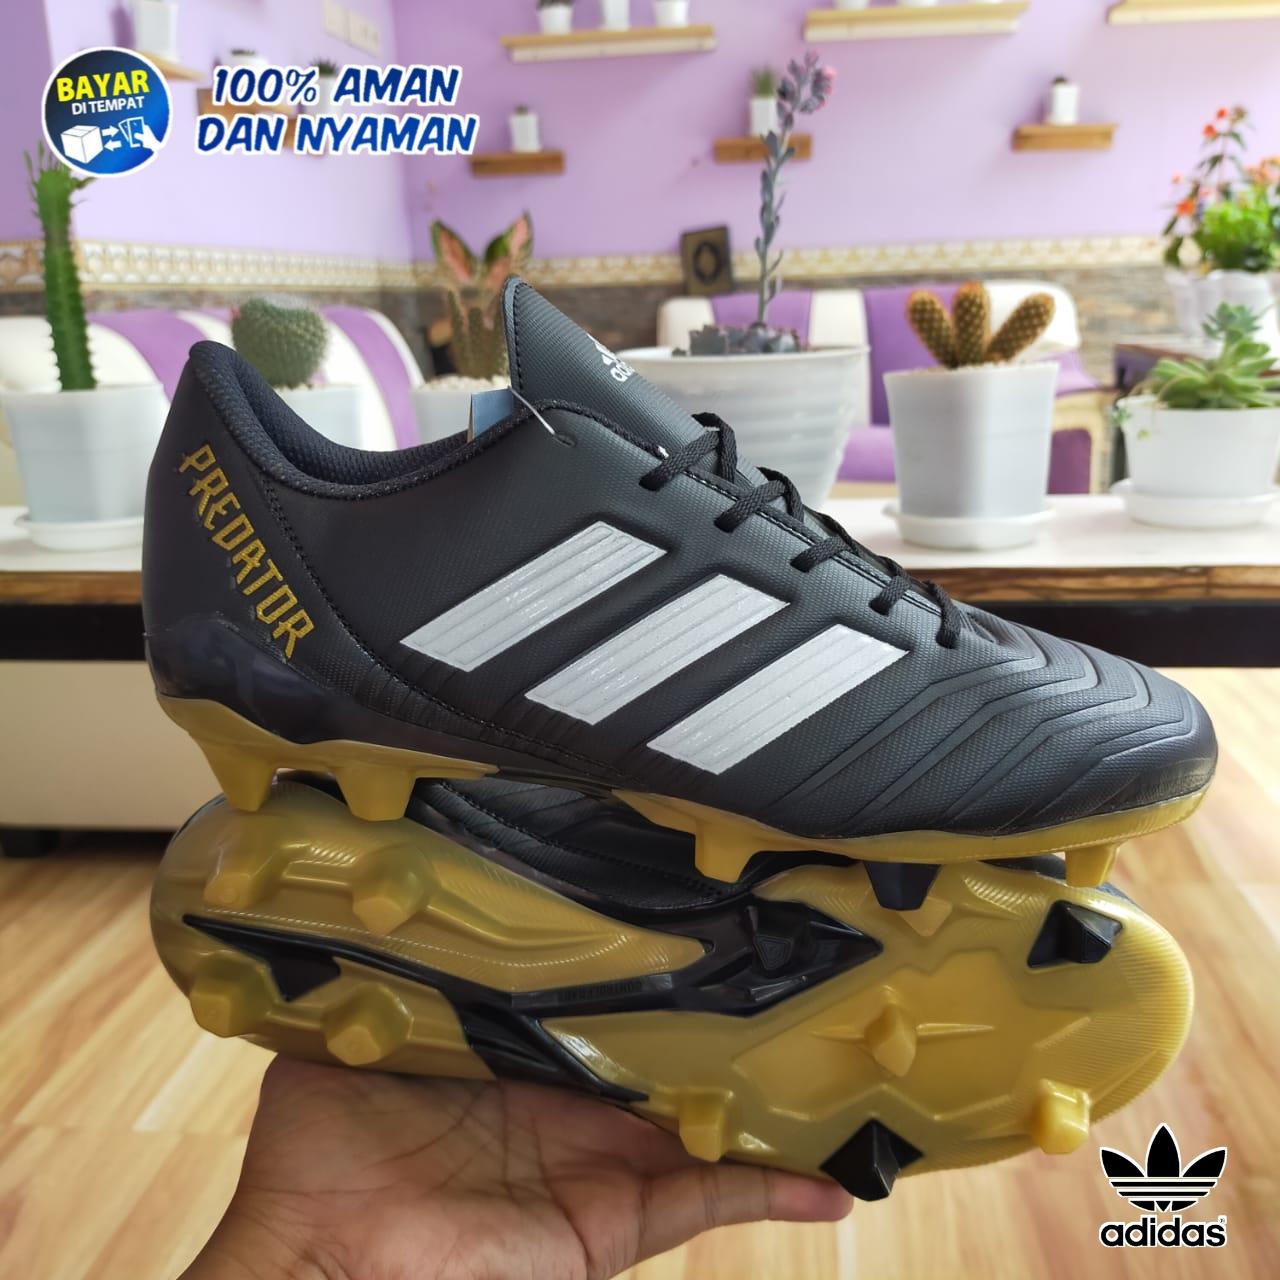 Sepatu Bola Adidas Predator Terbaru Komponen Original Warna Black/White/Gold